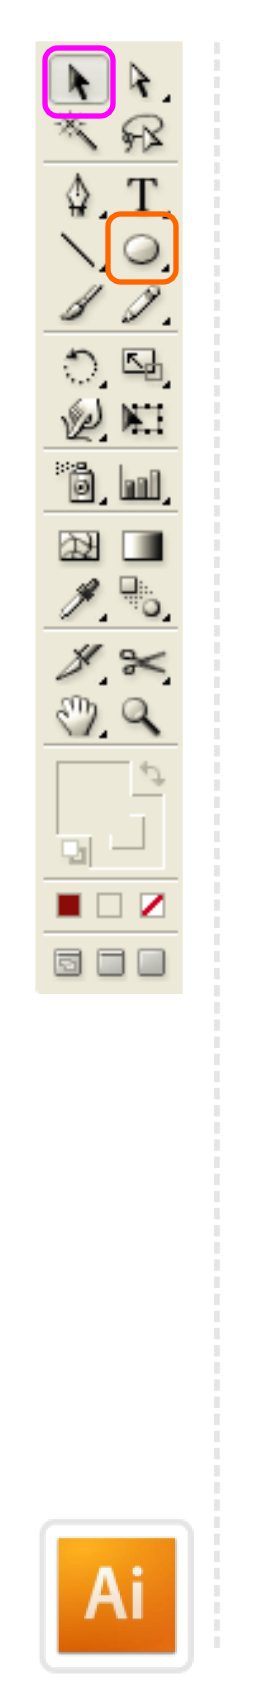 2Dgameartguru illustrator toolbar